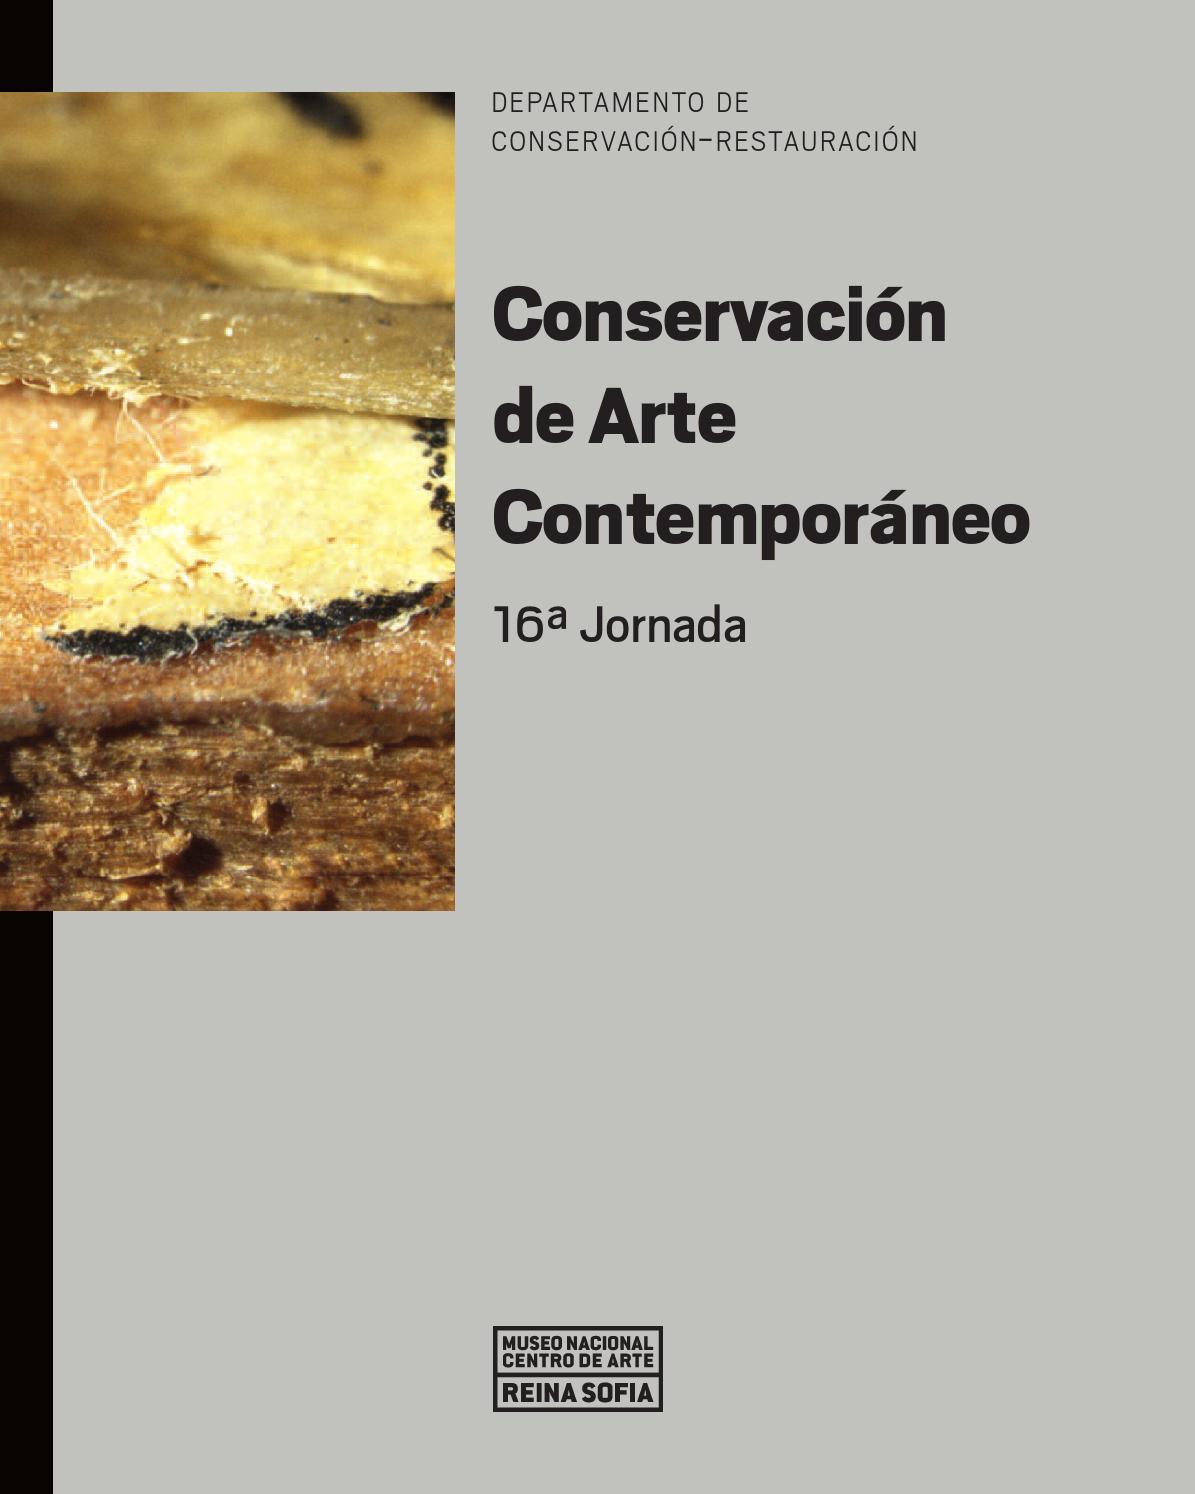 Conservación de Arte Contemporáneo. 16ª Jornada by Museo Reina Sofía ...